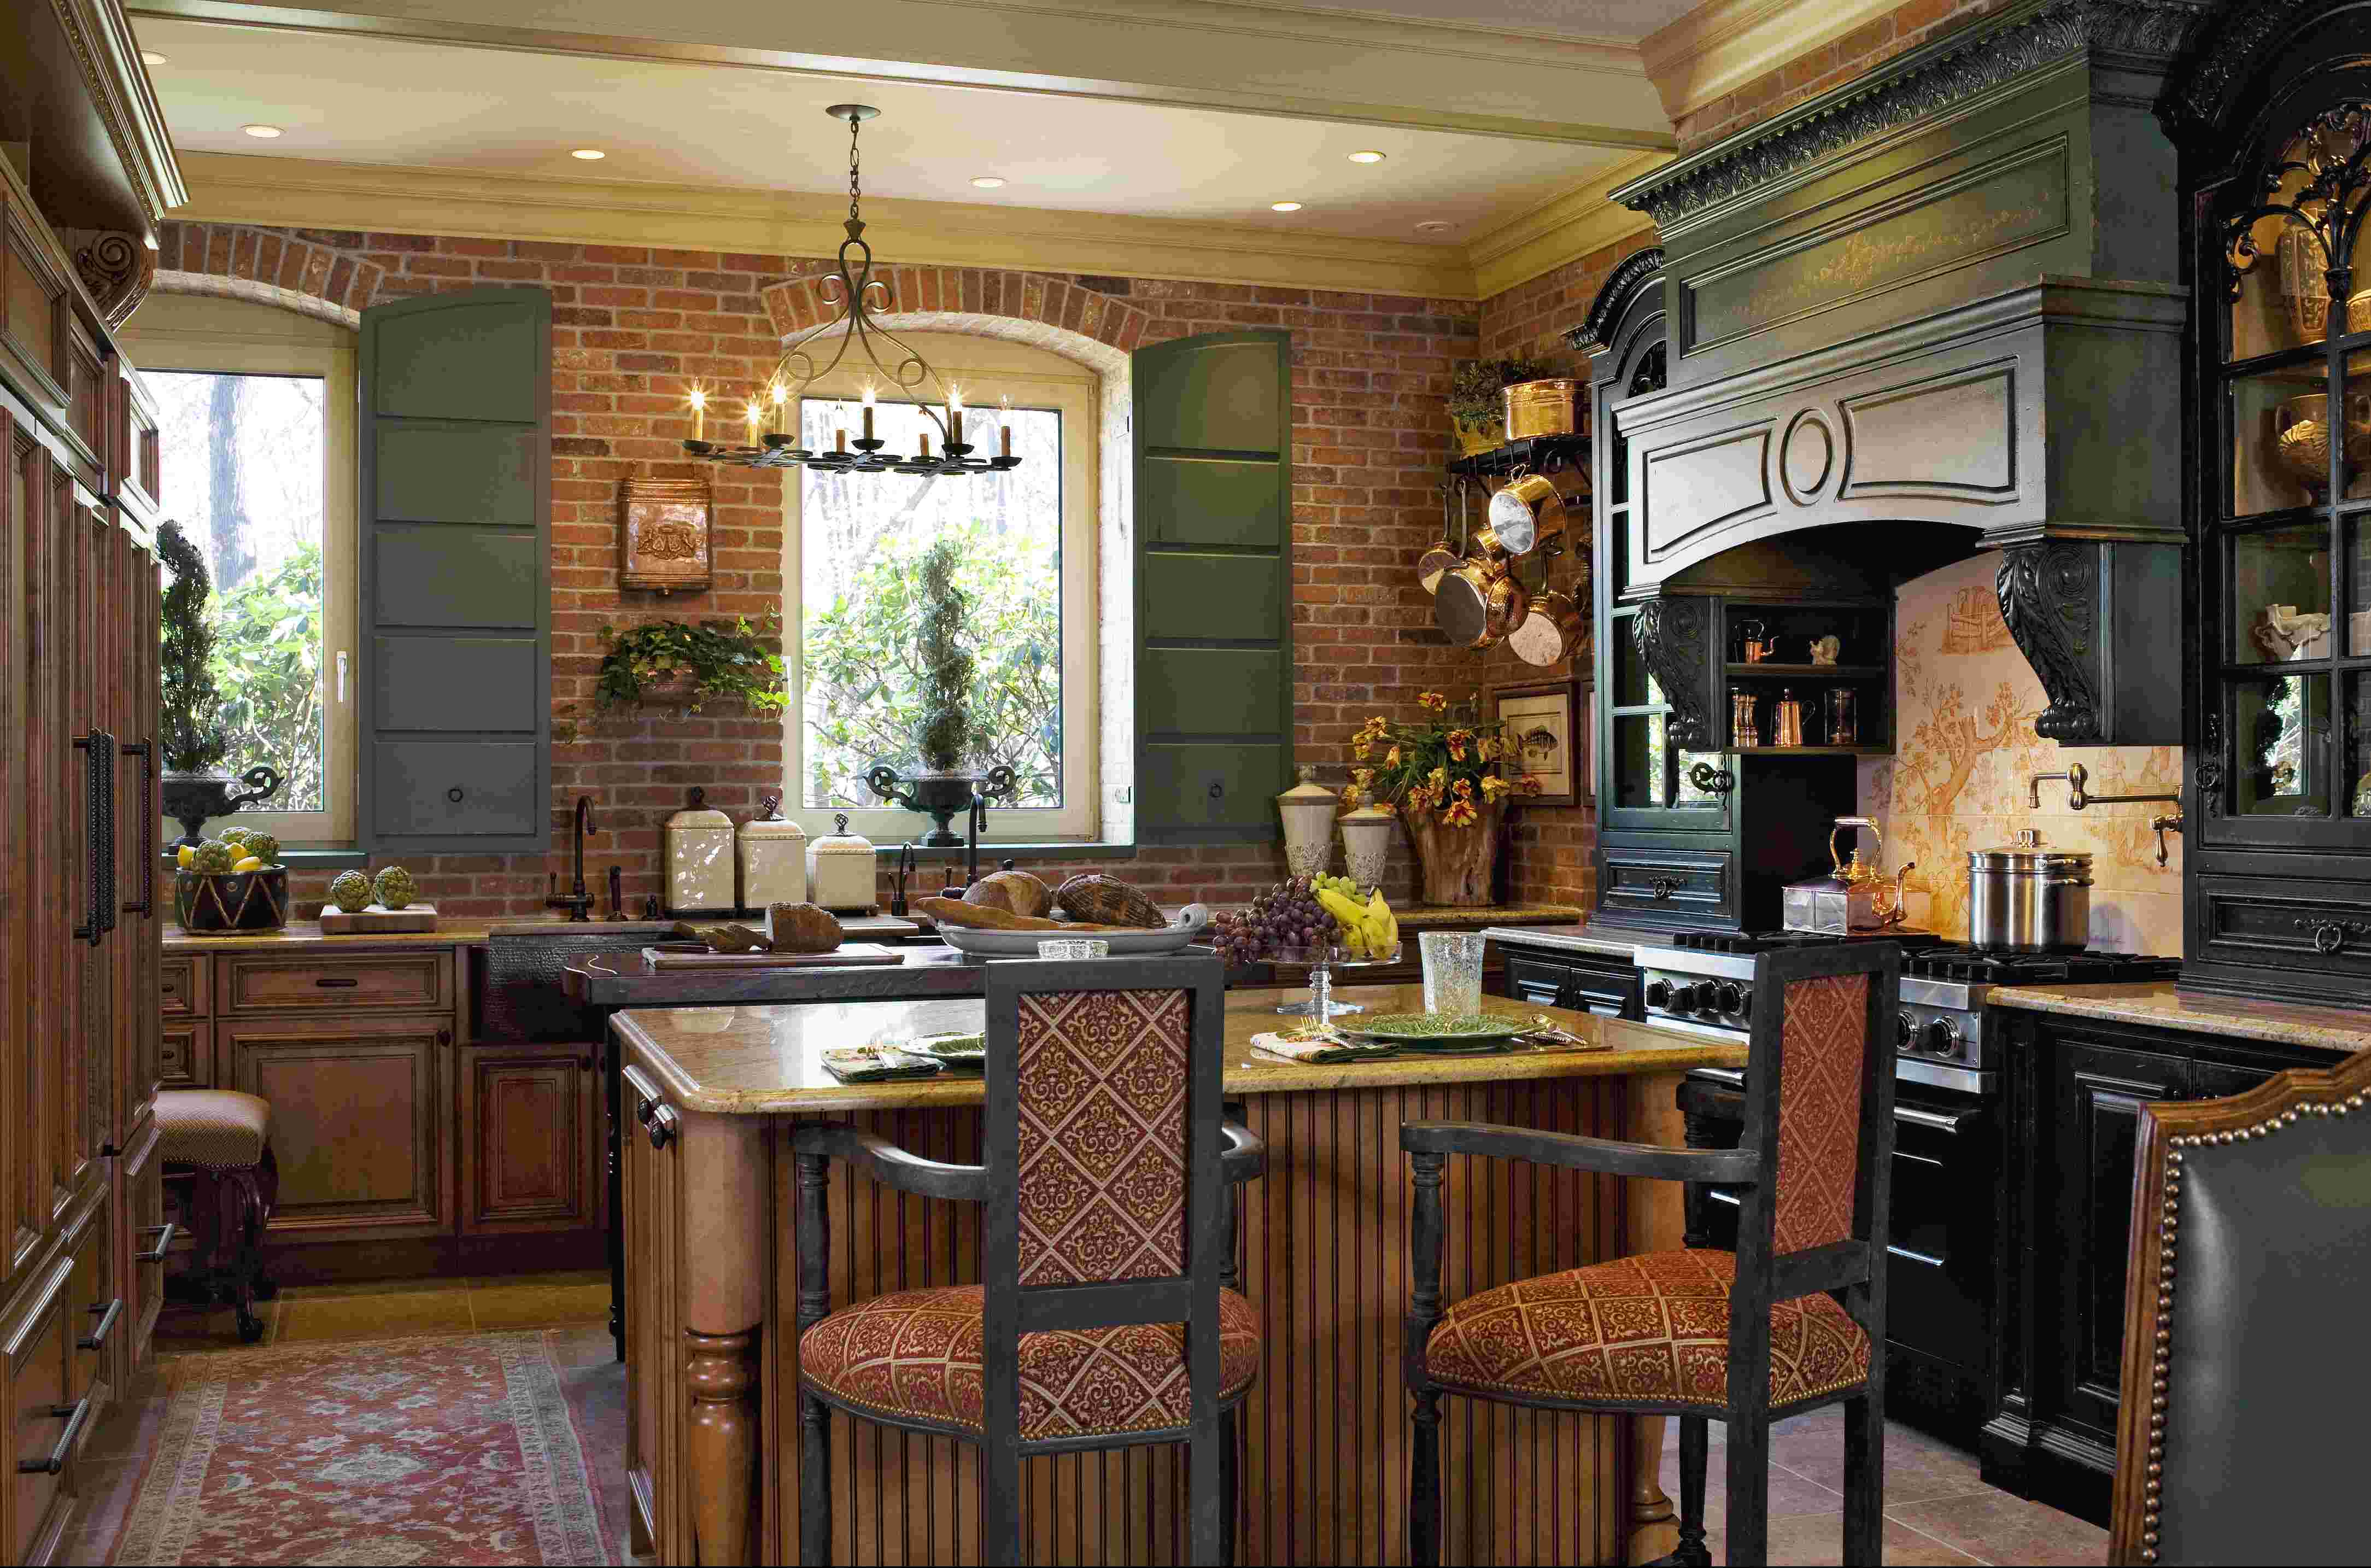 primitive french country centerpiece whimsy farmhouse kitchen decor 4337x2868